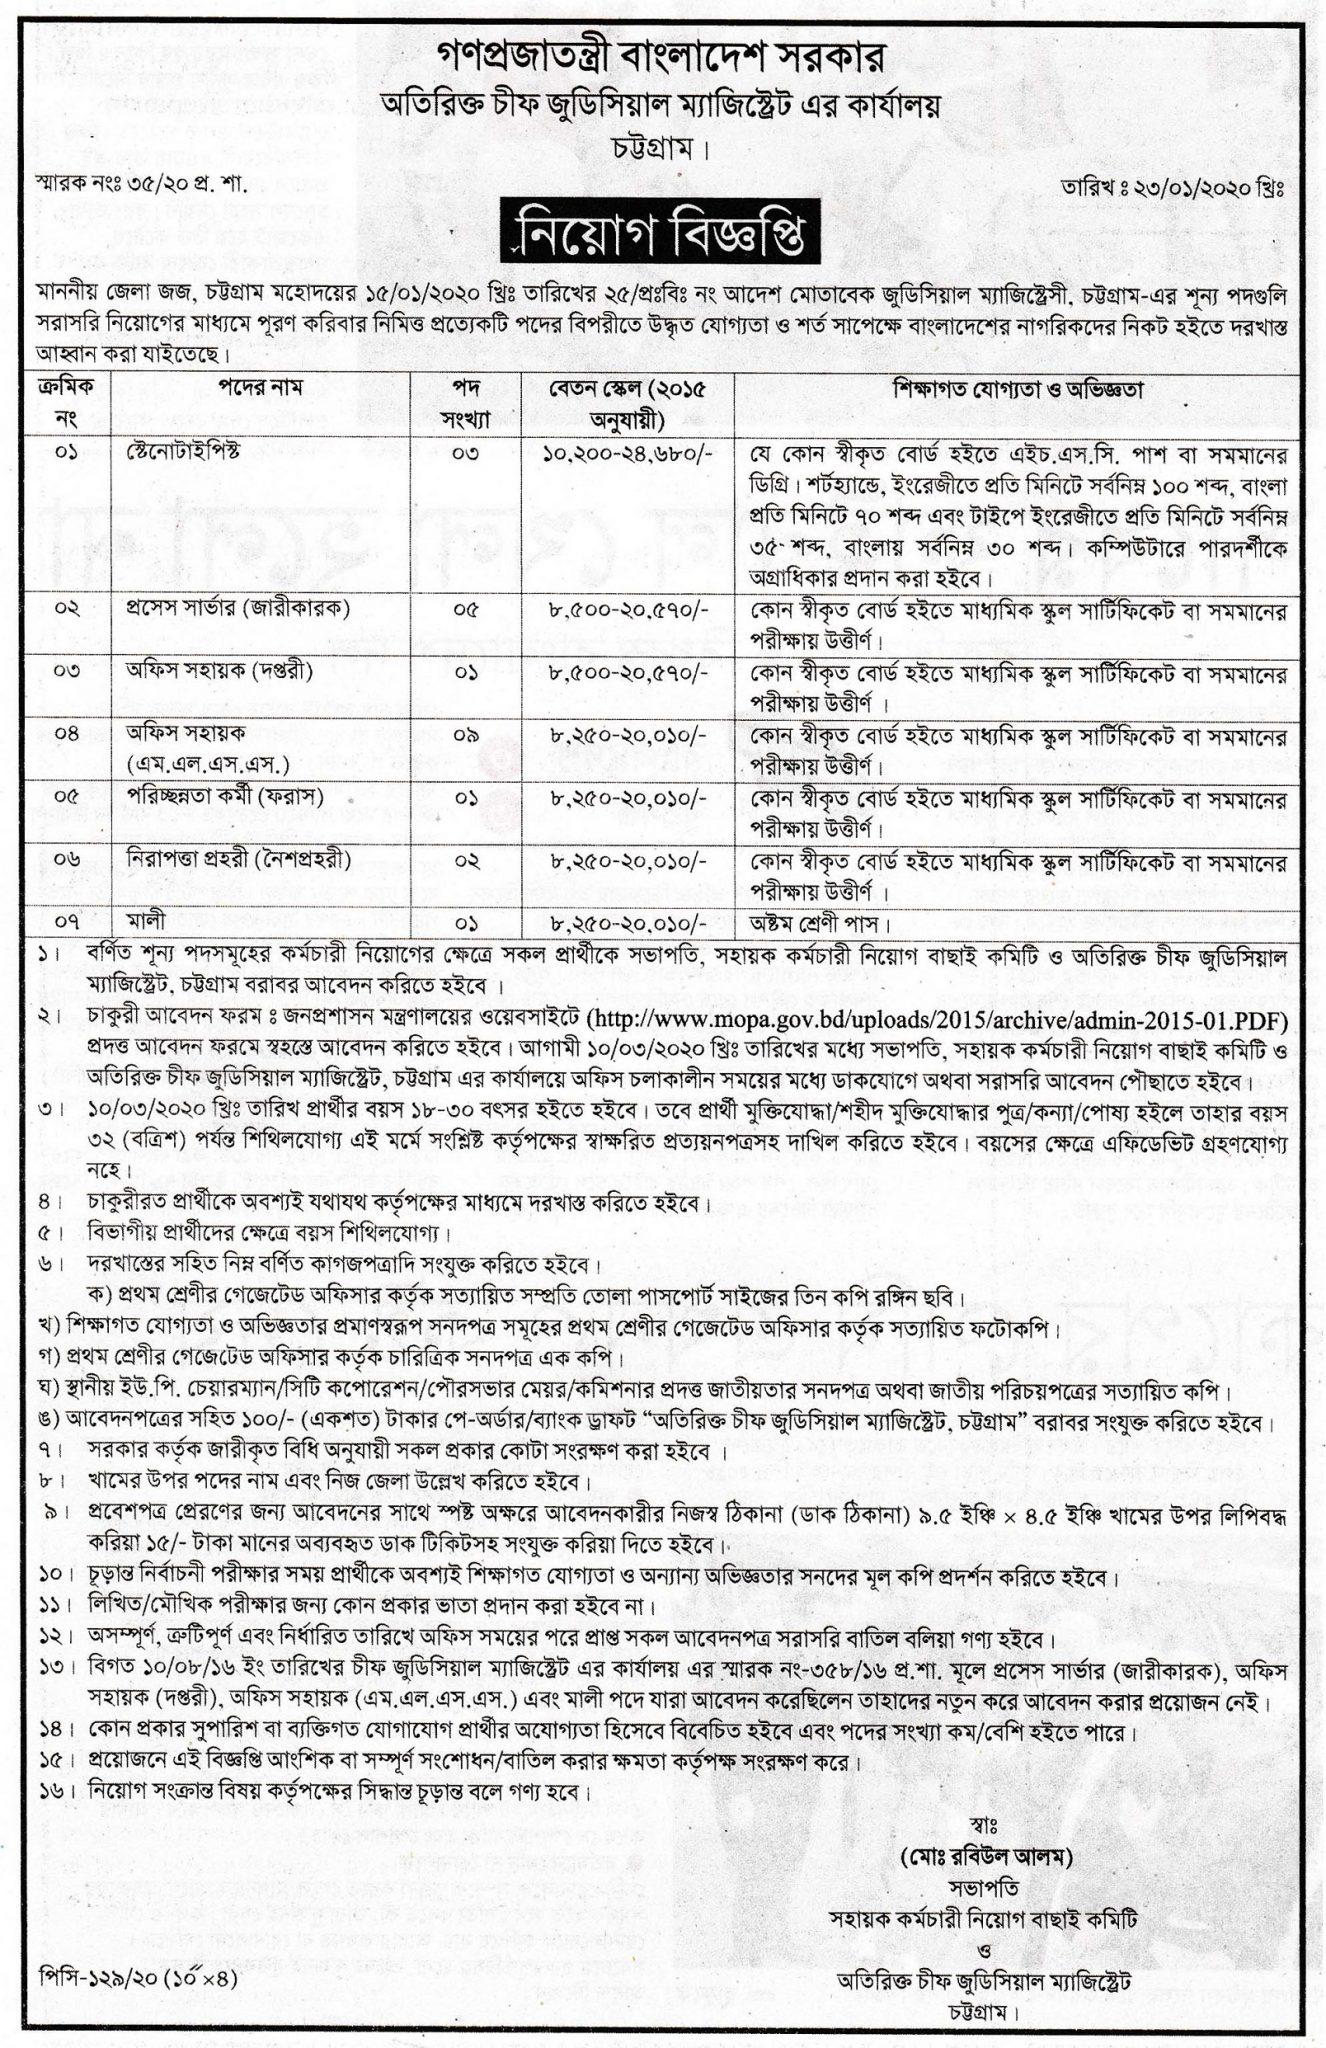 Additional Chief Judicial Magistrate Job Circular 2020